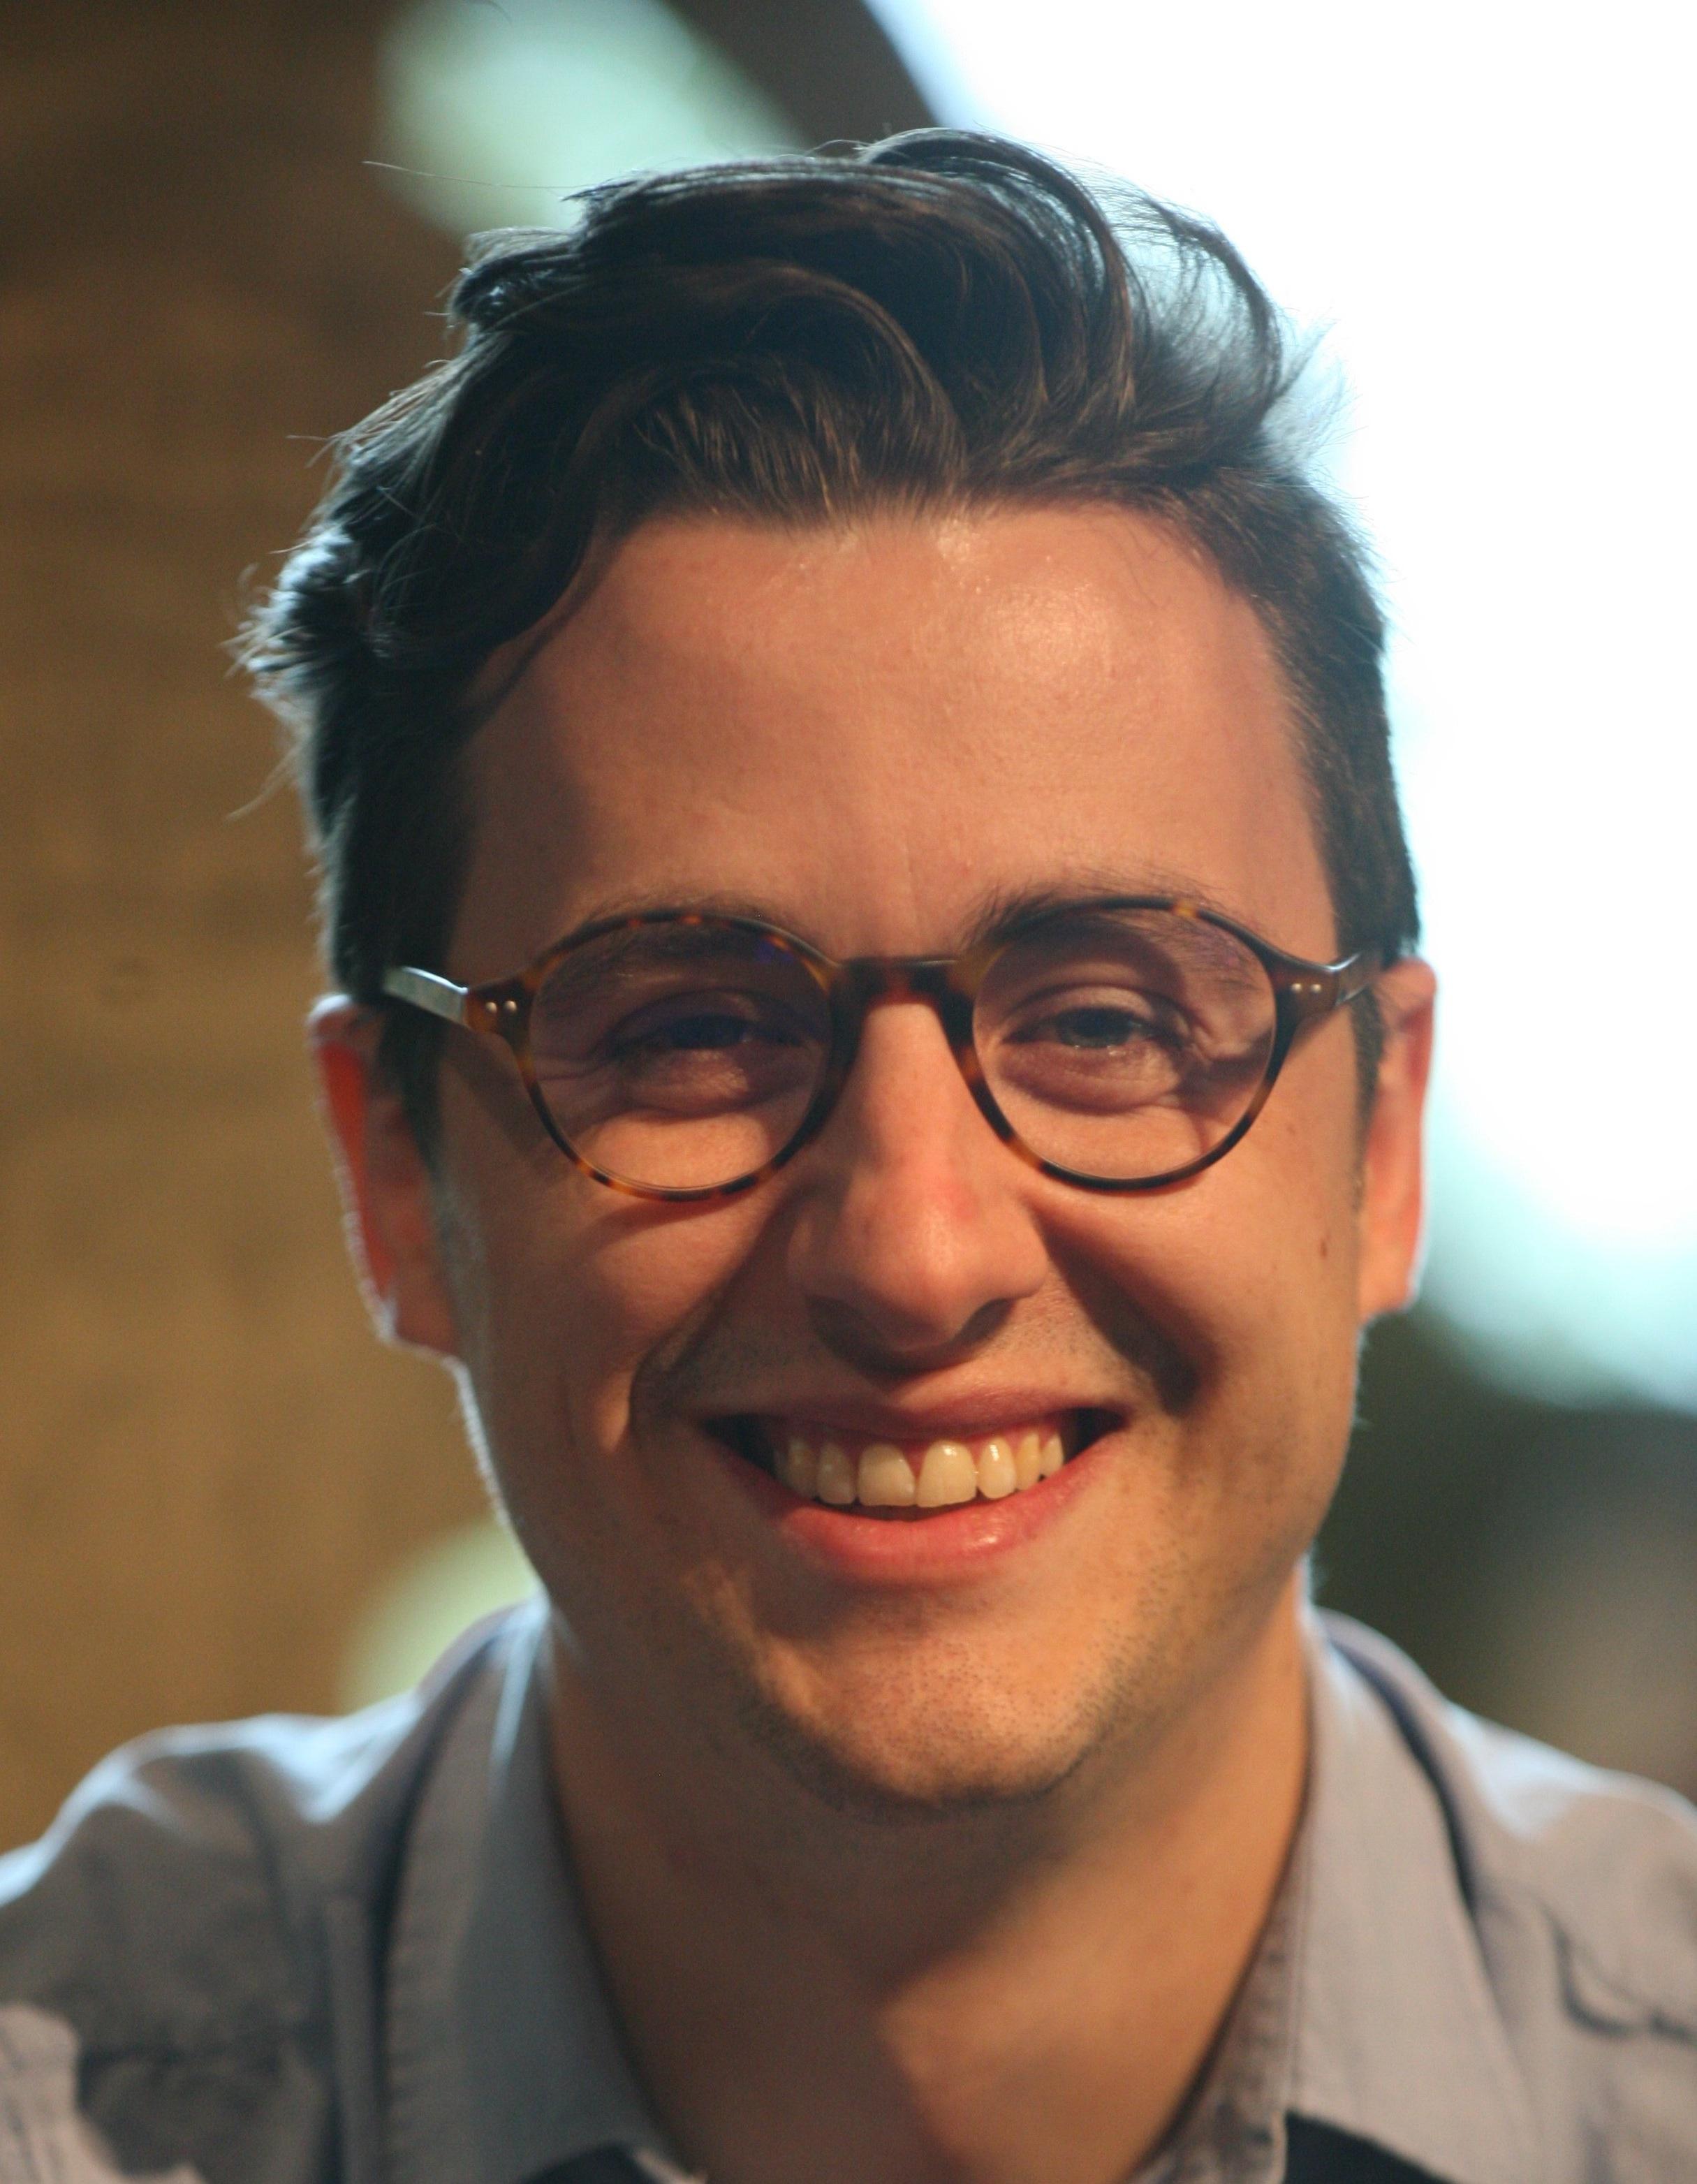 Youth Pastor, Jon Beadle